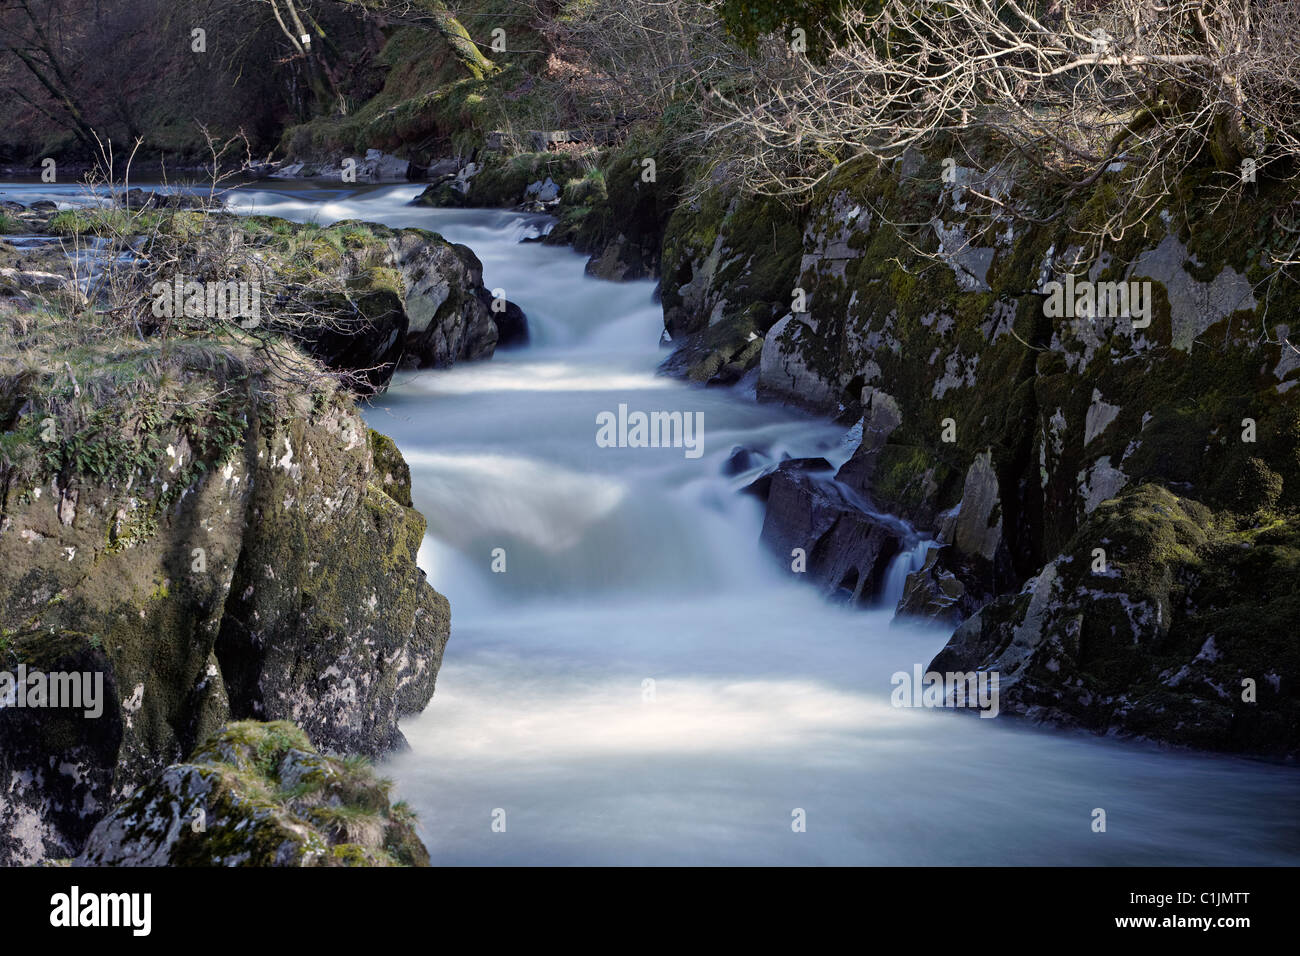 Cenarth Falls, the river Teifi, Cenarth, Cardiganshire, Wales, UK - Stock Image